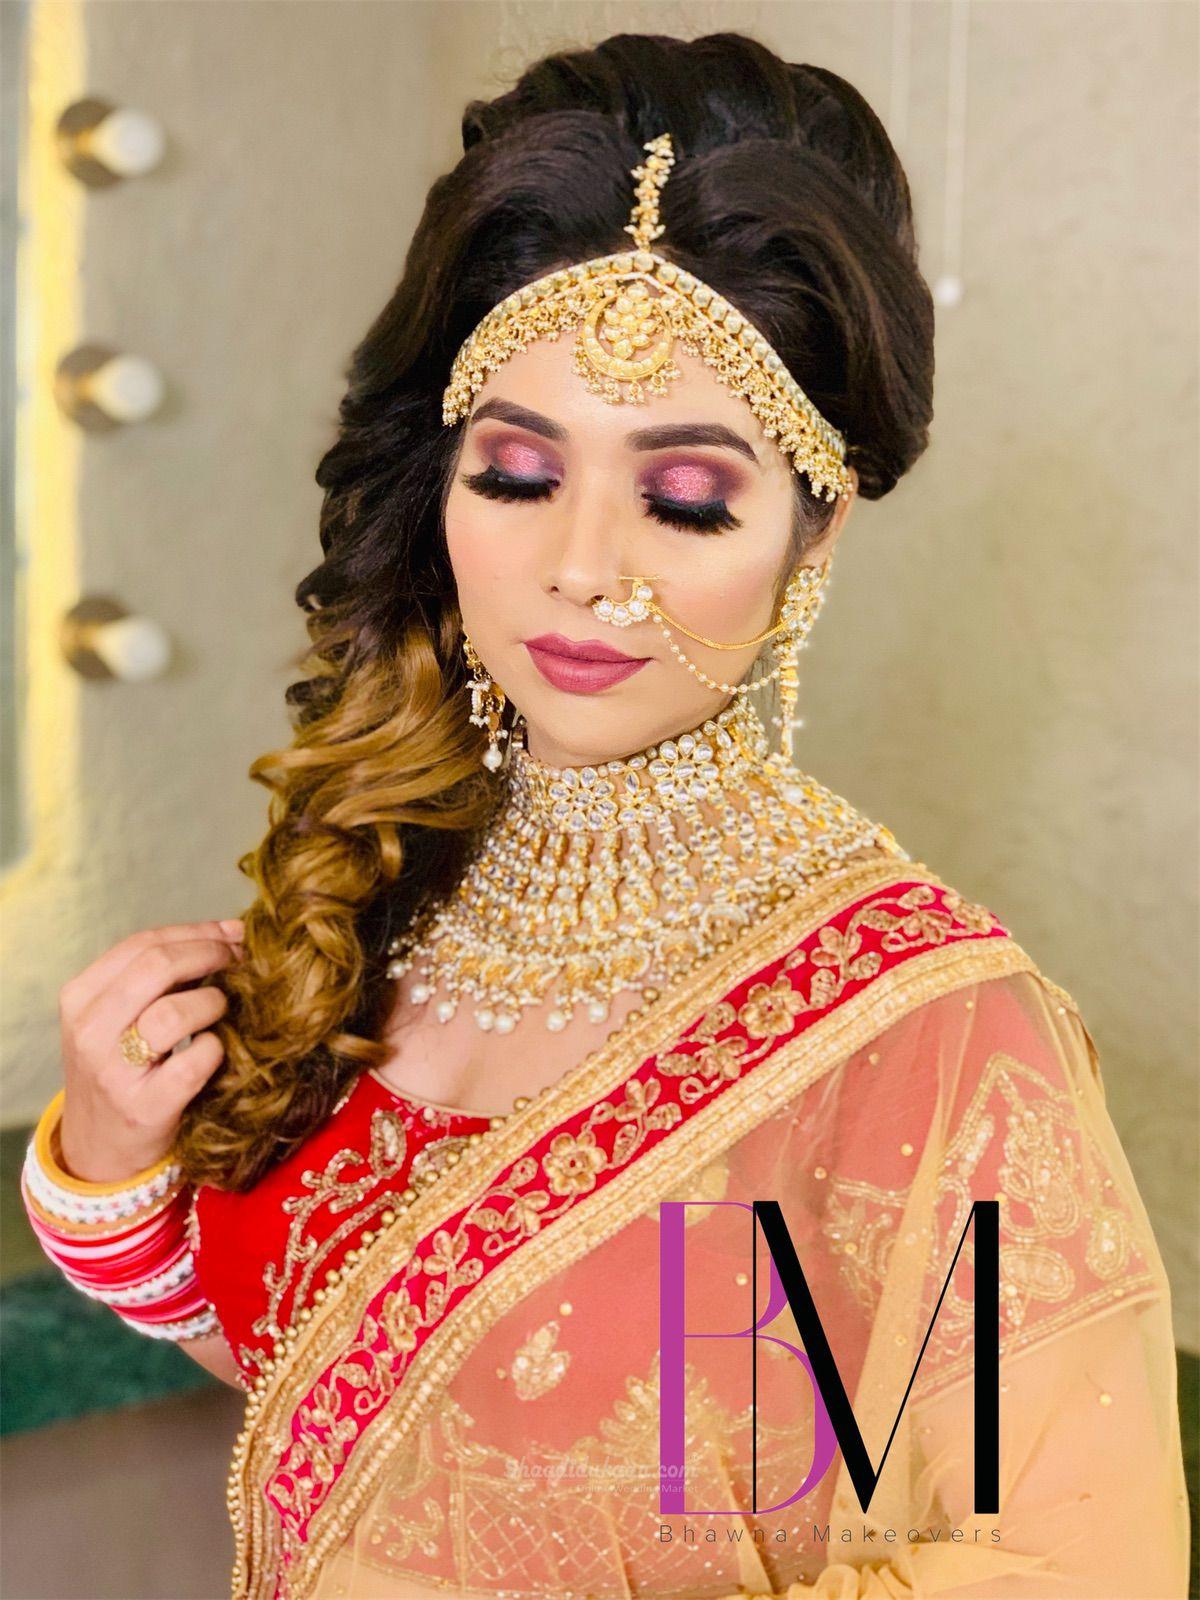 Bhawna Makeover Salon & Academy